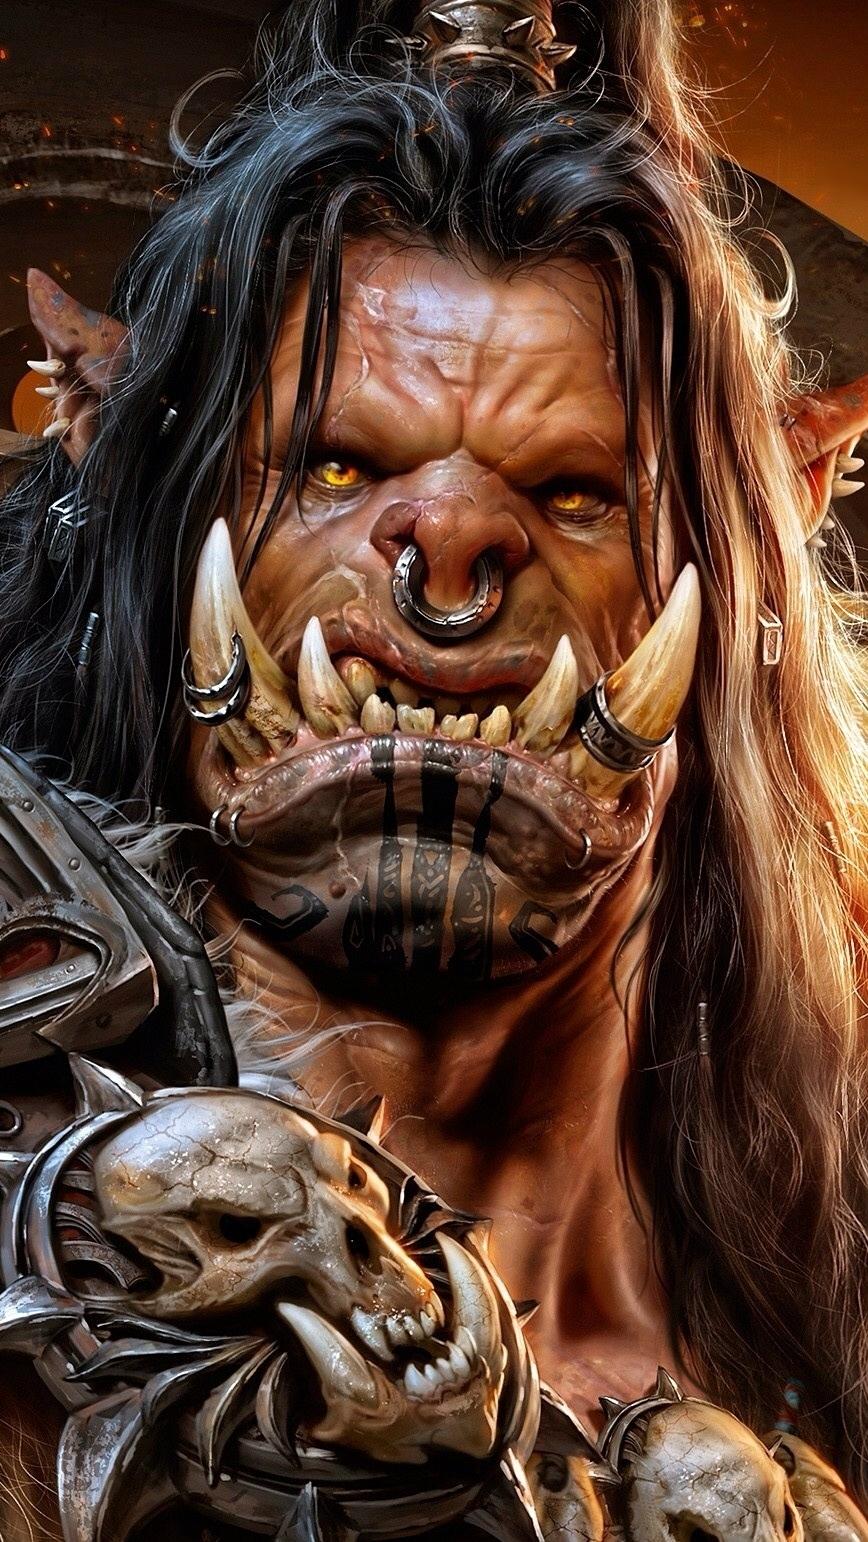 Grommash Hellscream z gry Warlords of Draenor